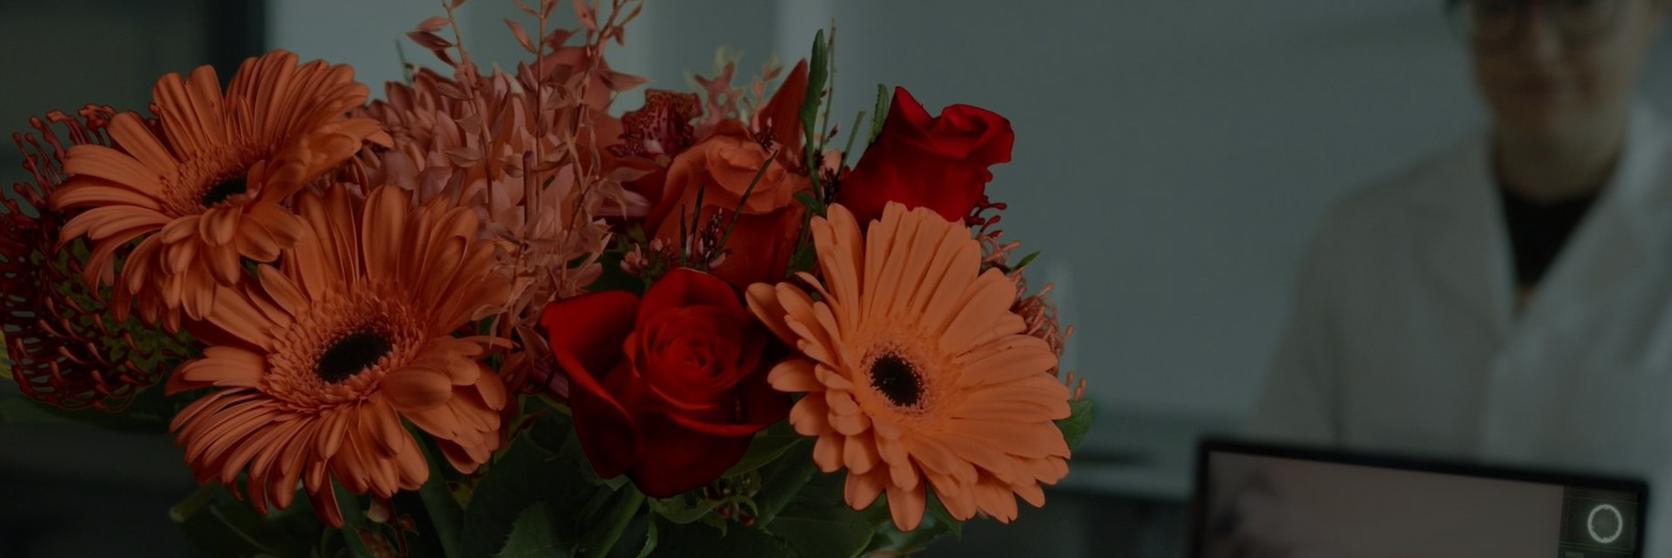 Mood-blooms-1